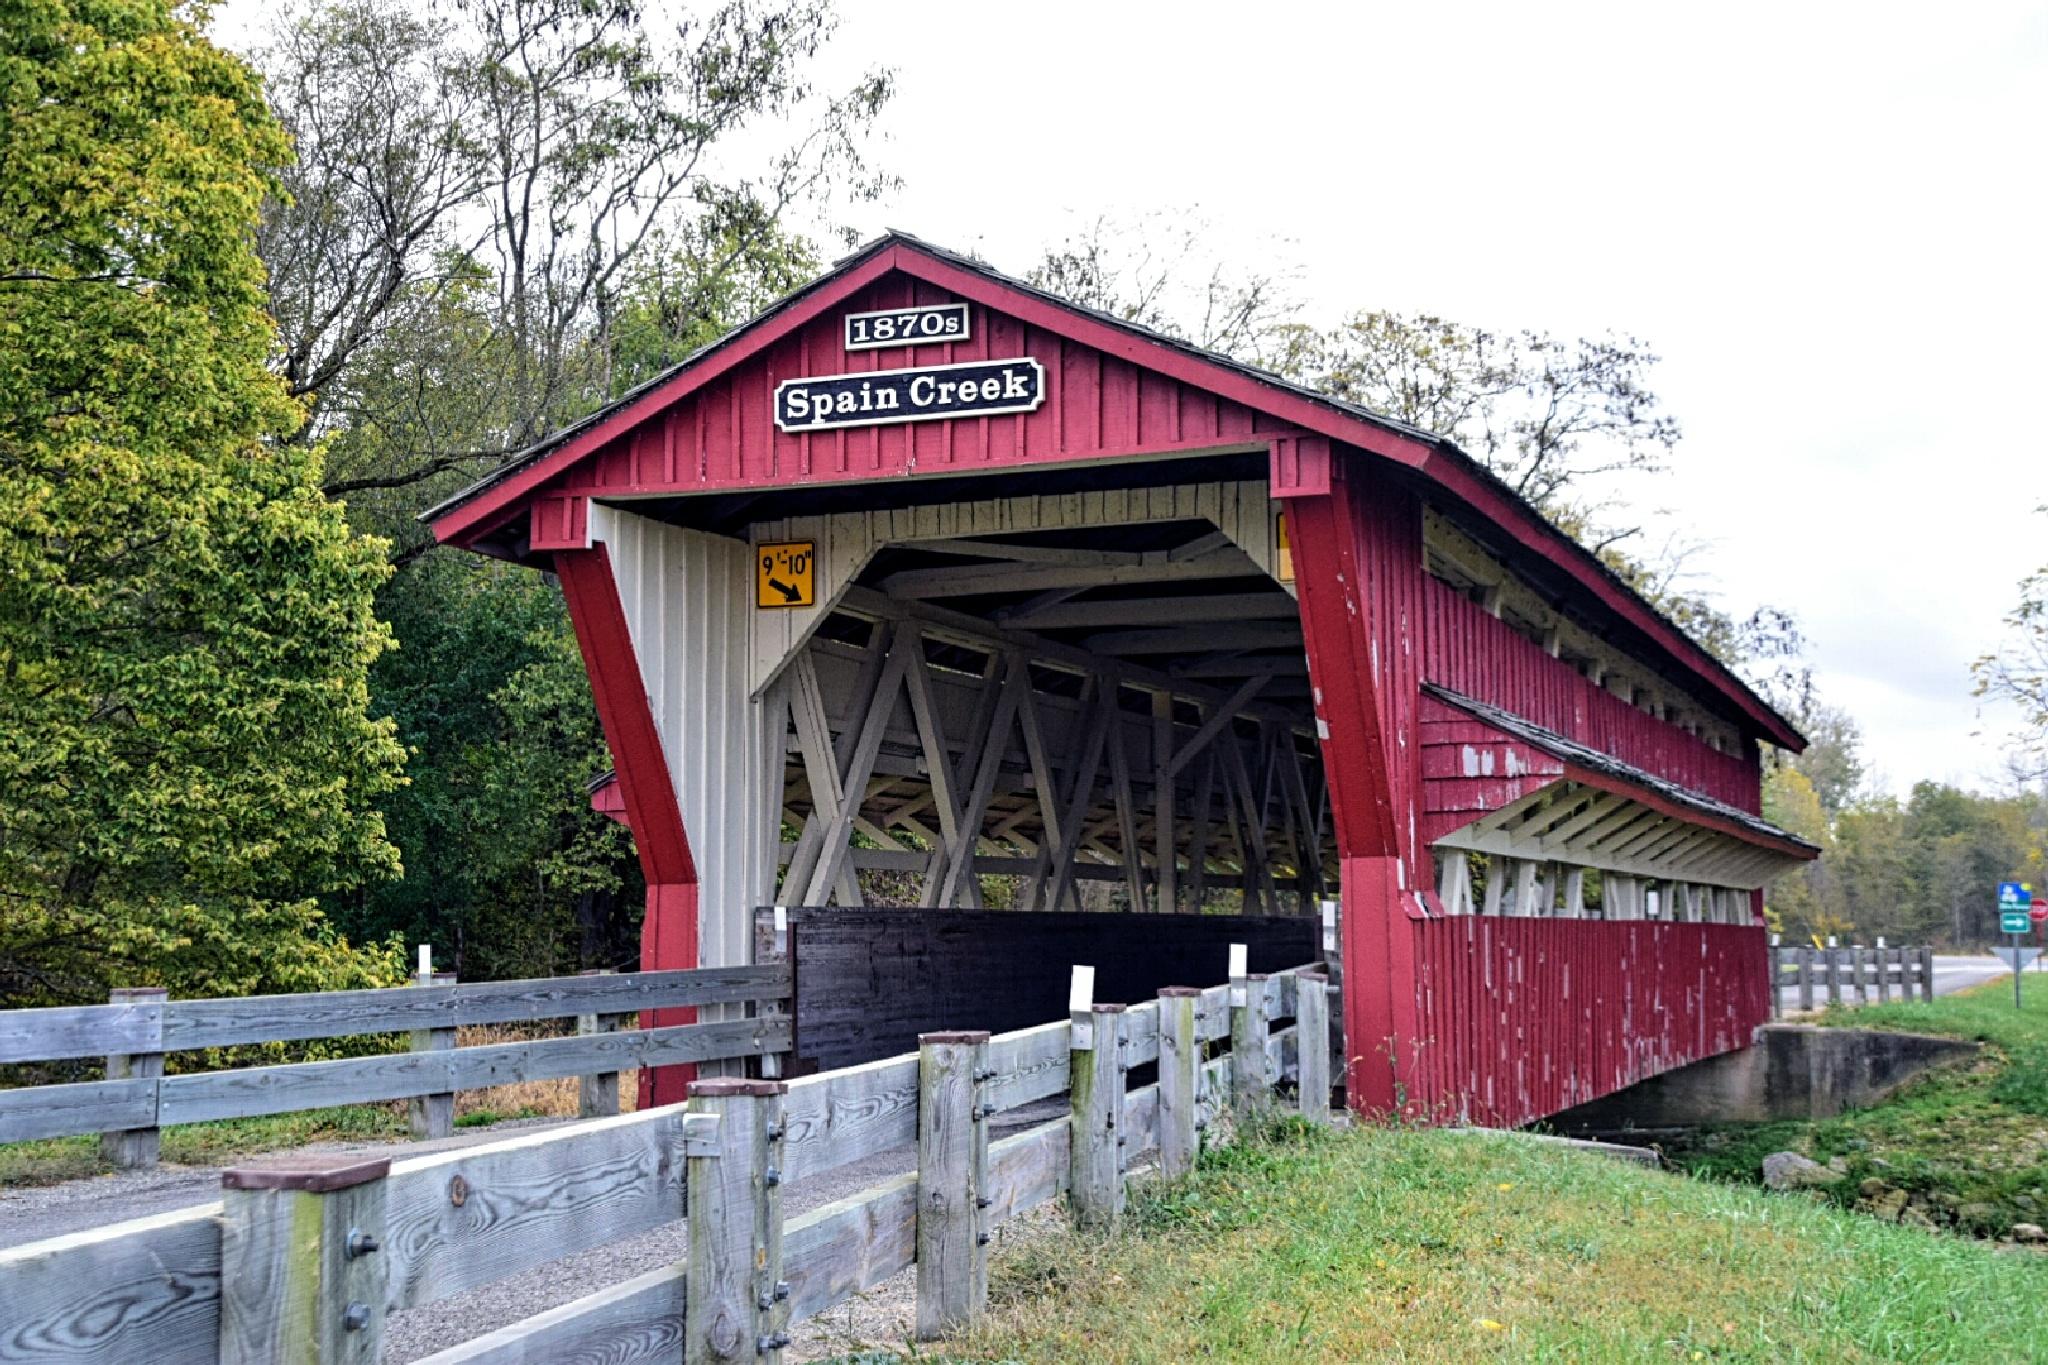 Spain Creek Covered Bridge by Tom Kitchen